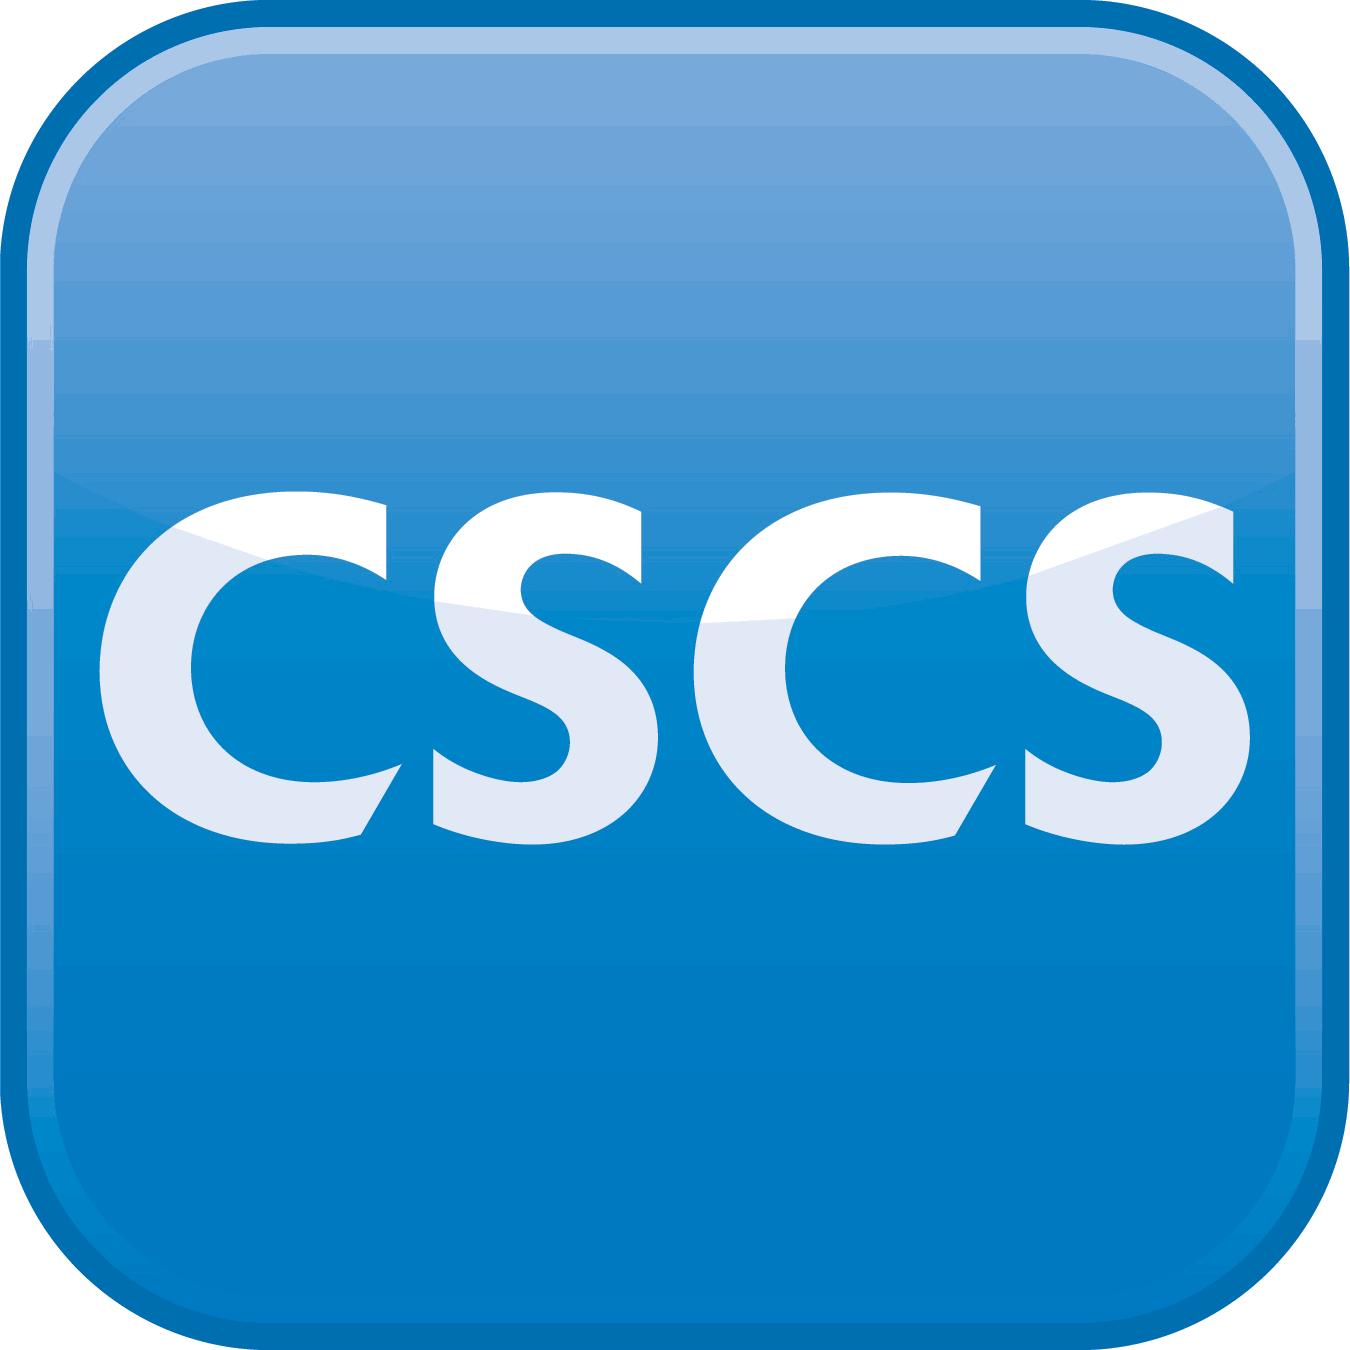 CSCS (Construction Skills Certificate Scheme) Logo